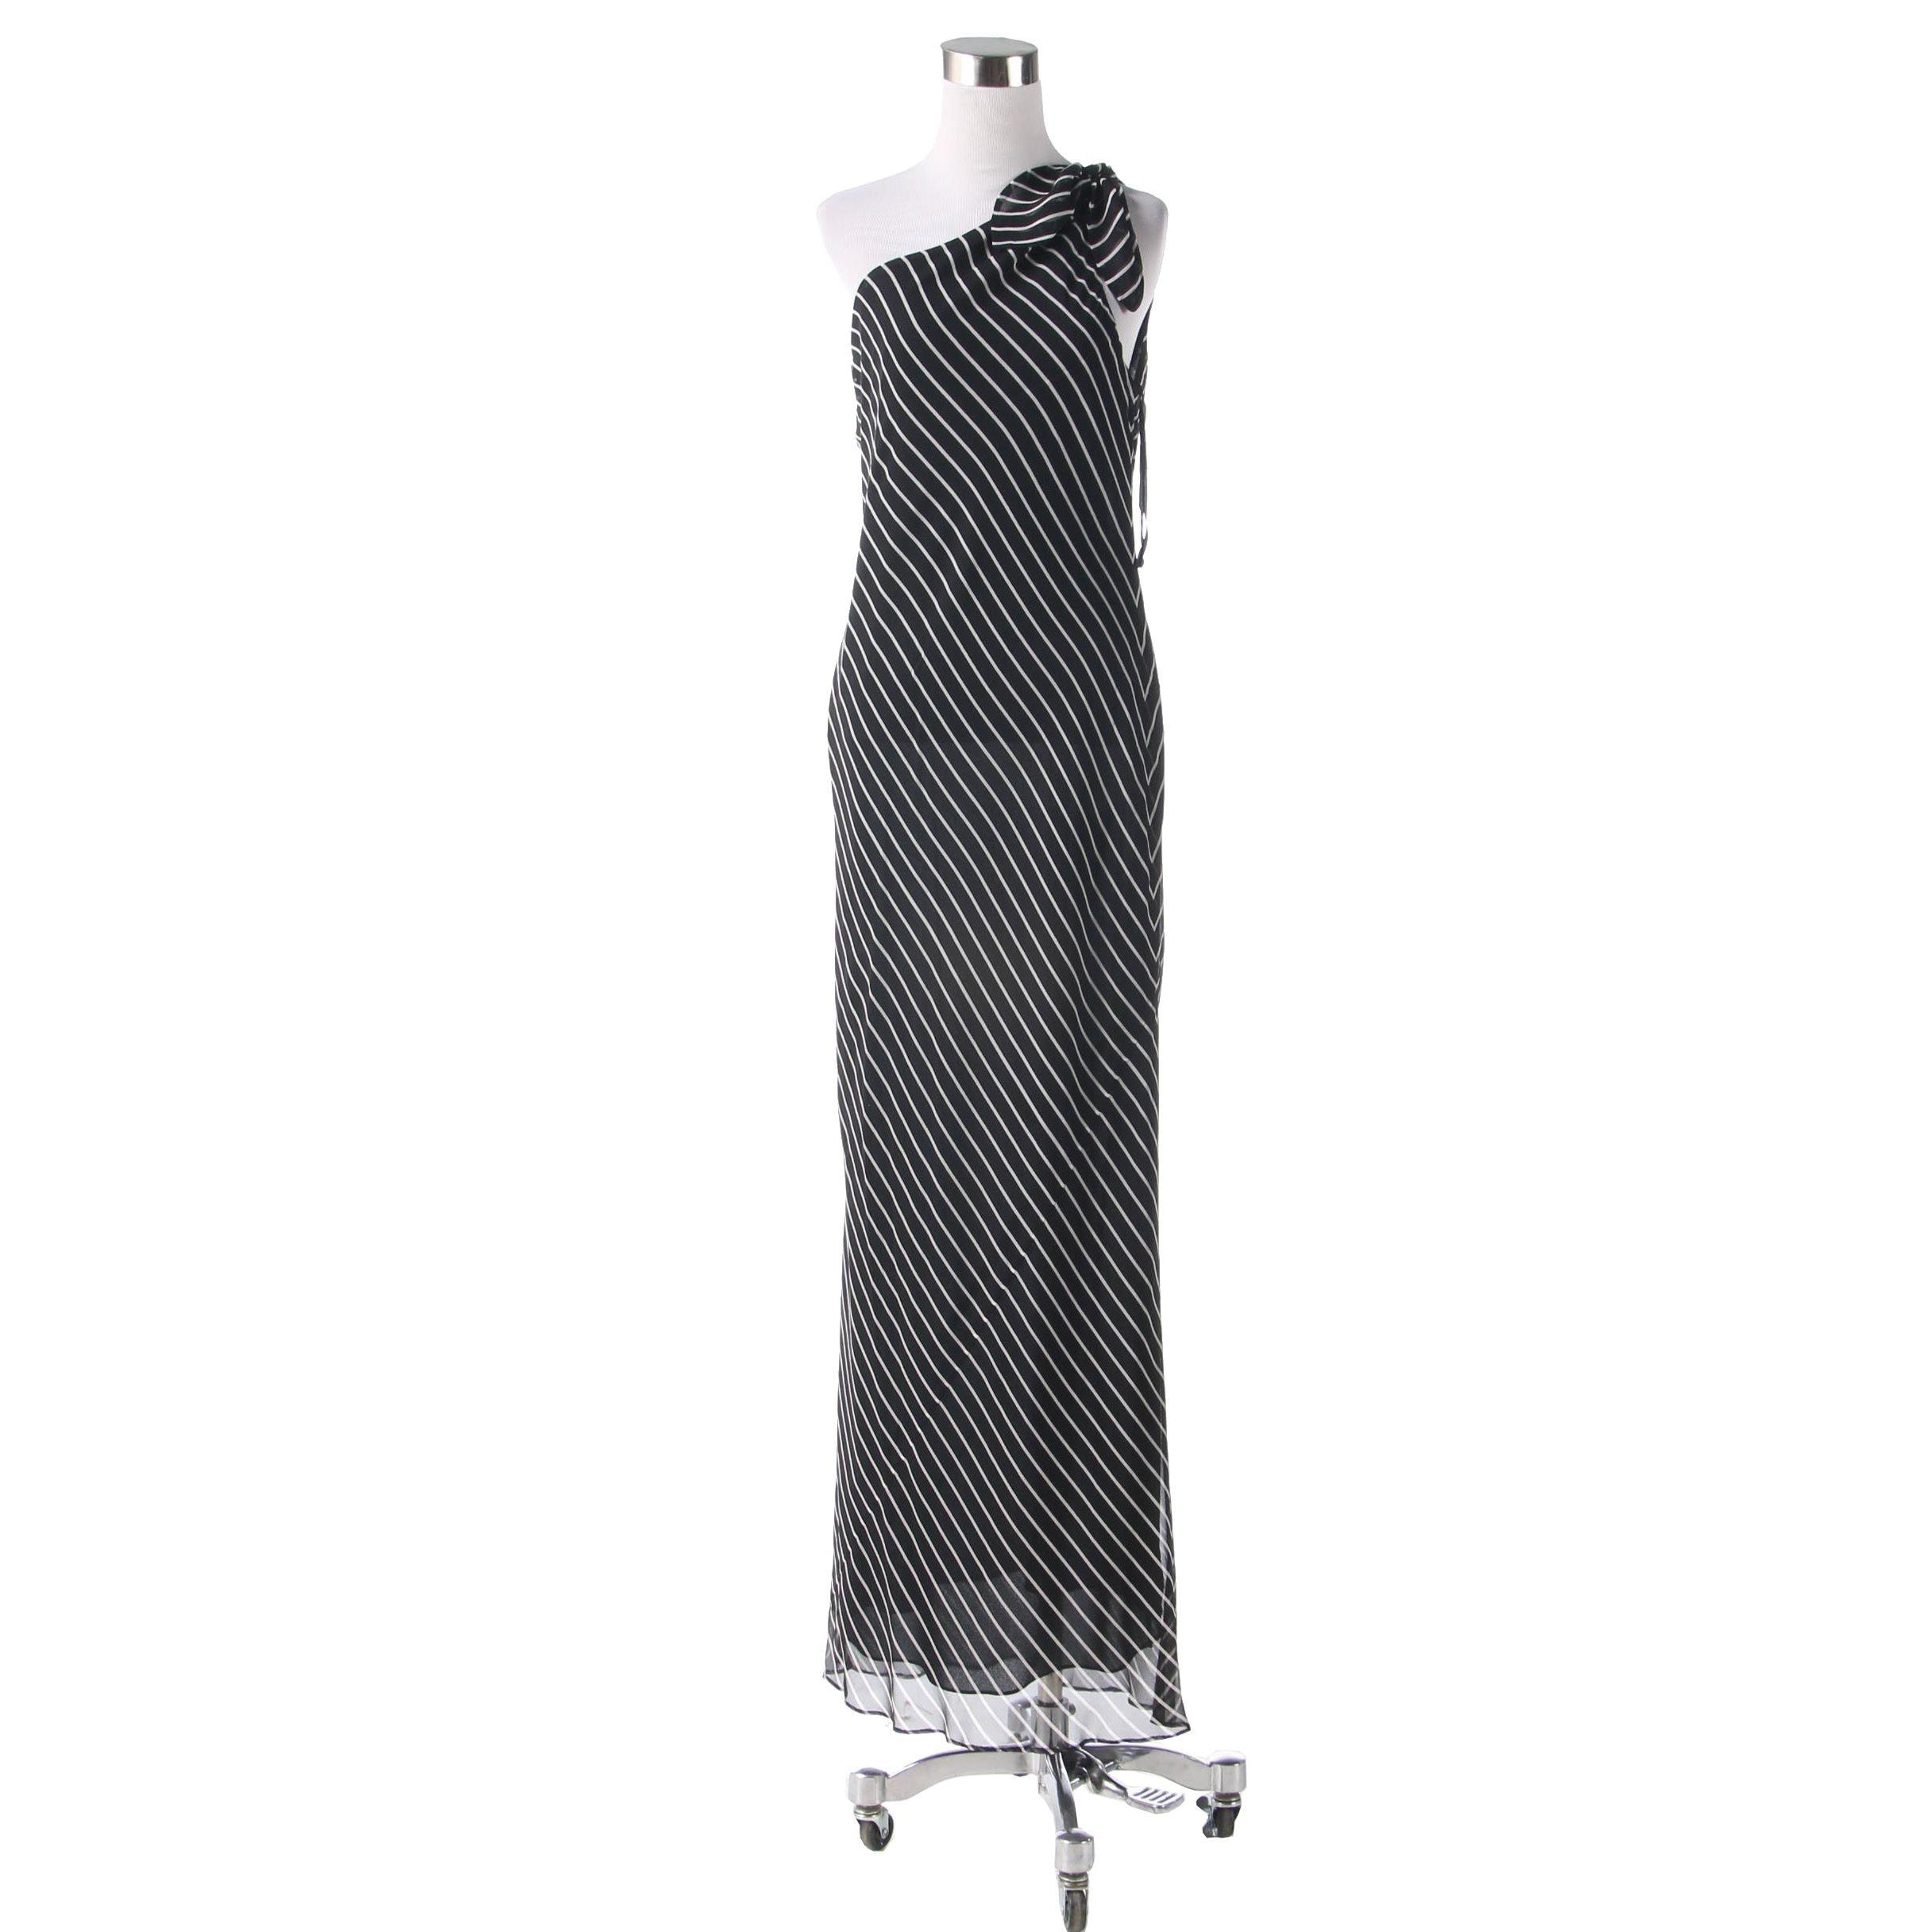 WorthWear Petite Silk One-Shoulder Evening Dress in Black and White Stripes